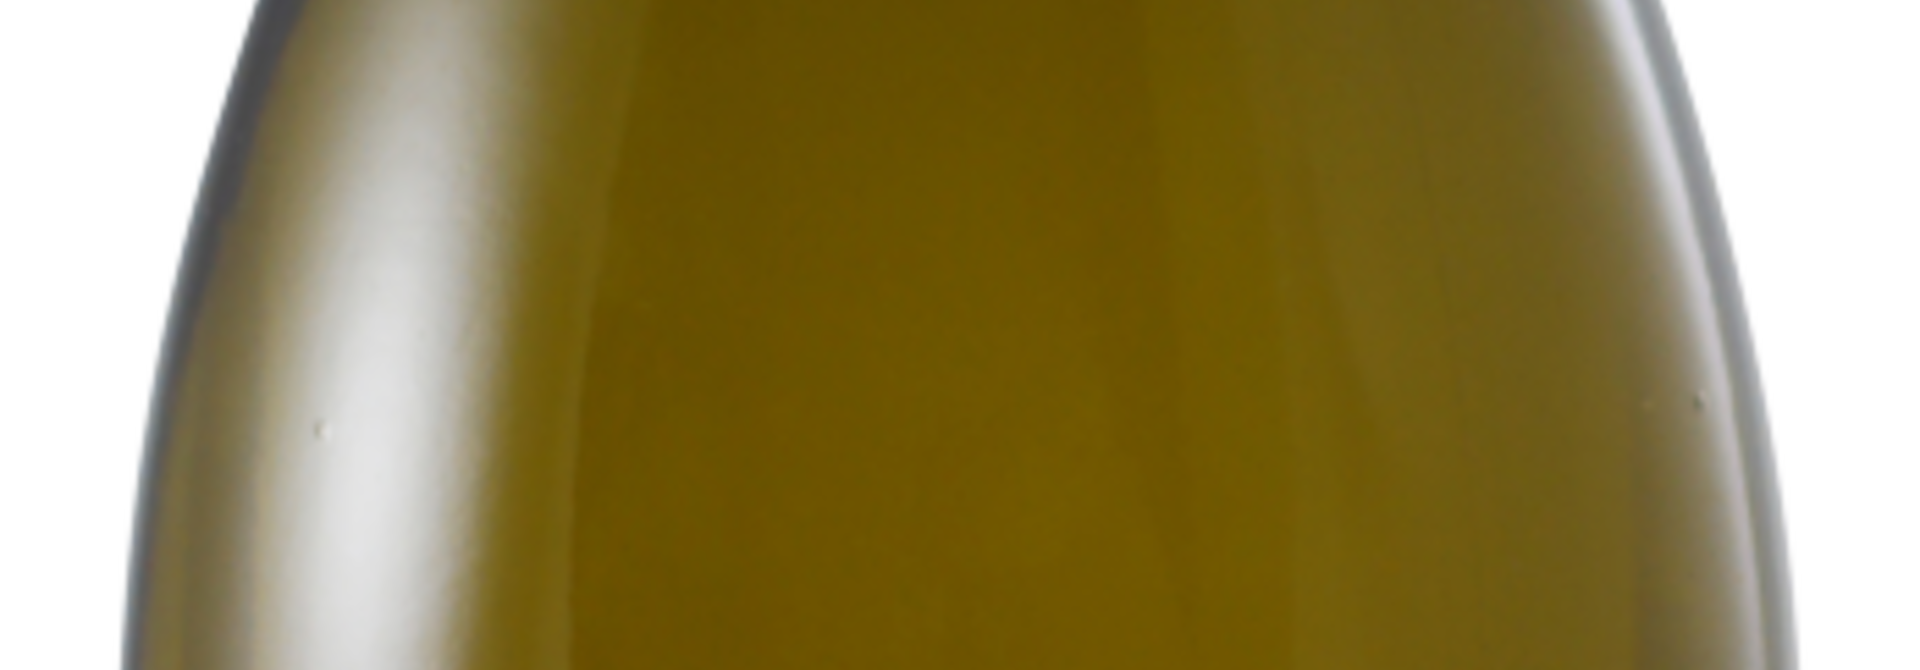 Weingut Franz Keller Chardonnay, Oberbergener Bassgeige Erste Lage 2019